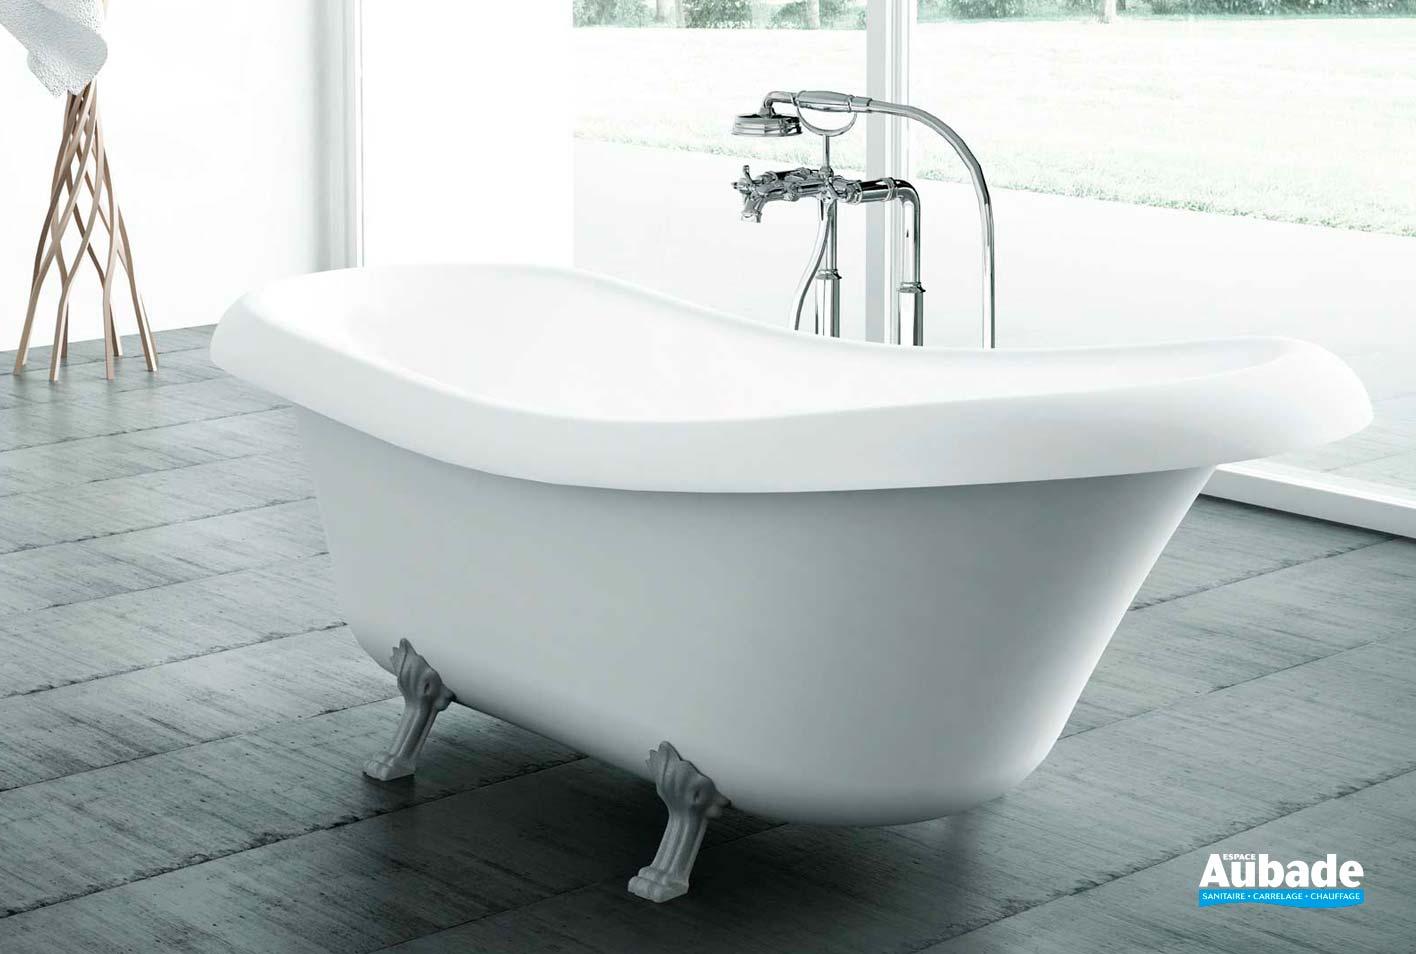 Baignoire Beton De Synthese baignoires cedam fidji cedam | espace aubade